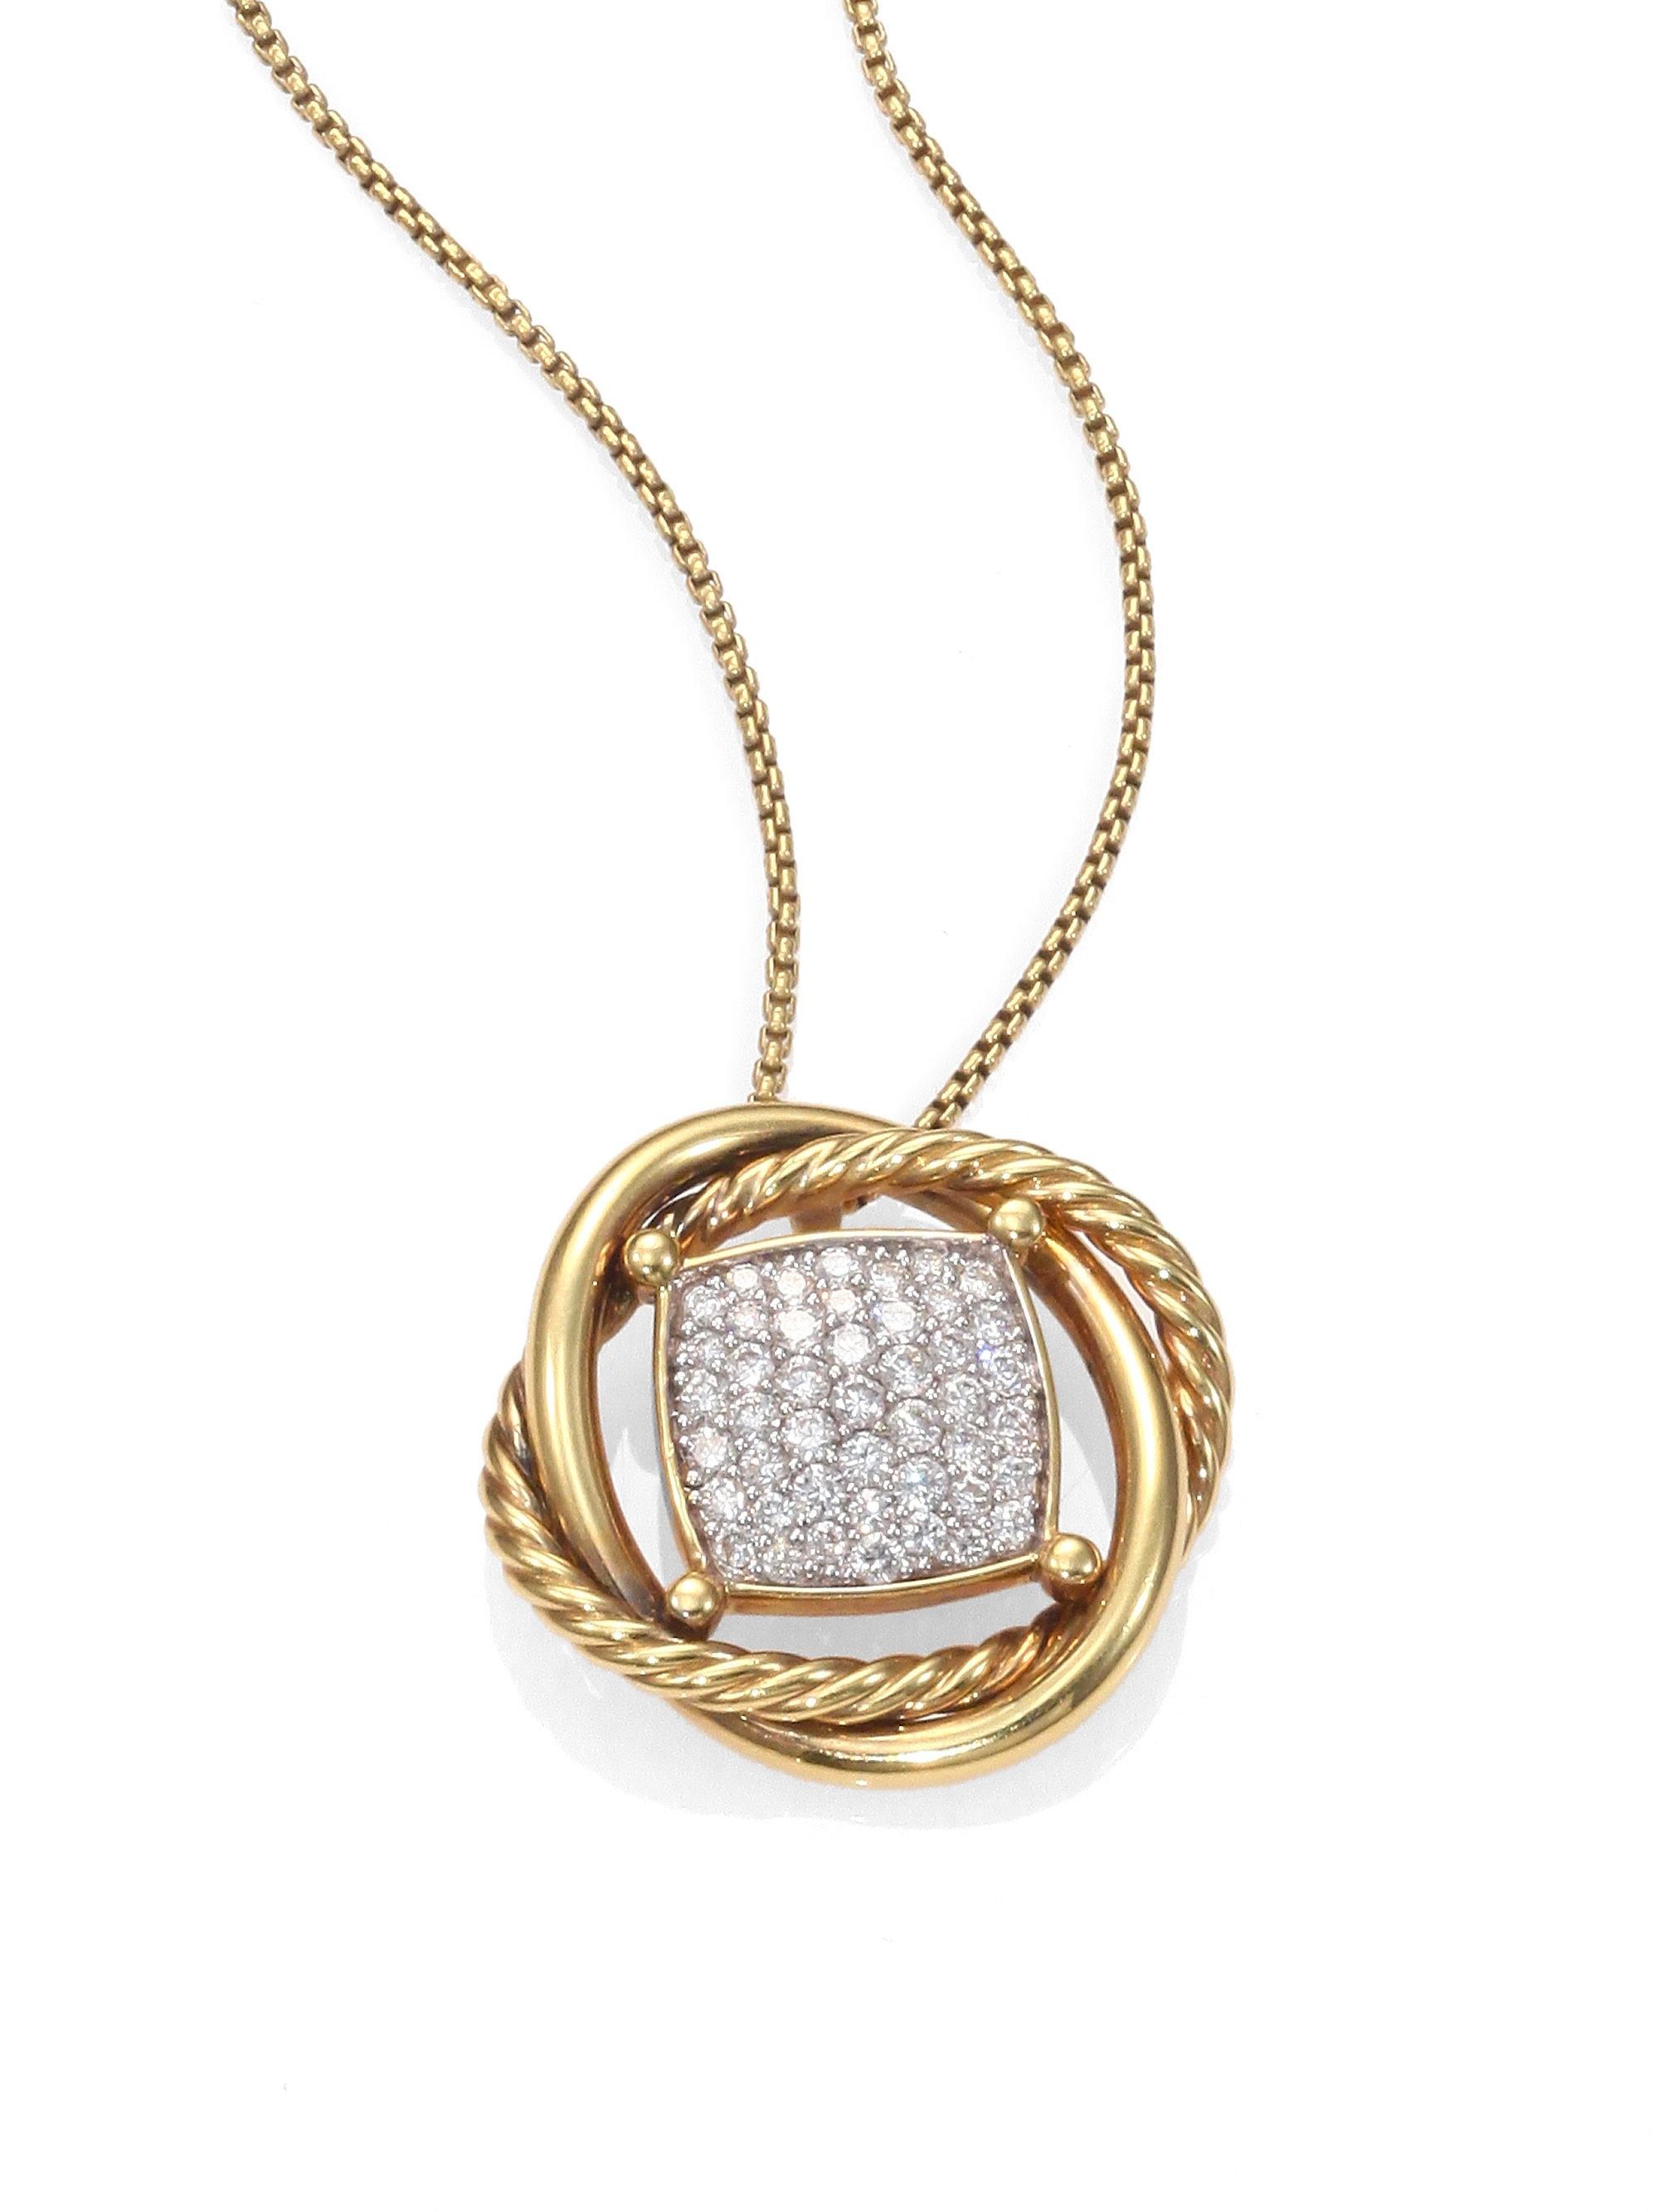 david yurman diamond and 18k gold pendant necklace in gold. Black Bedroom Furniture Sets. Home Design Ideas